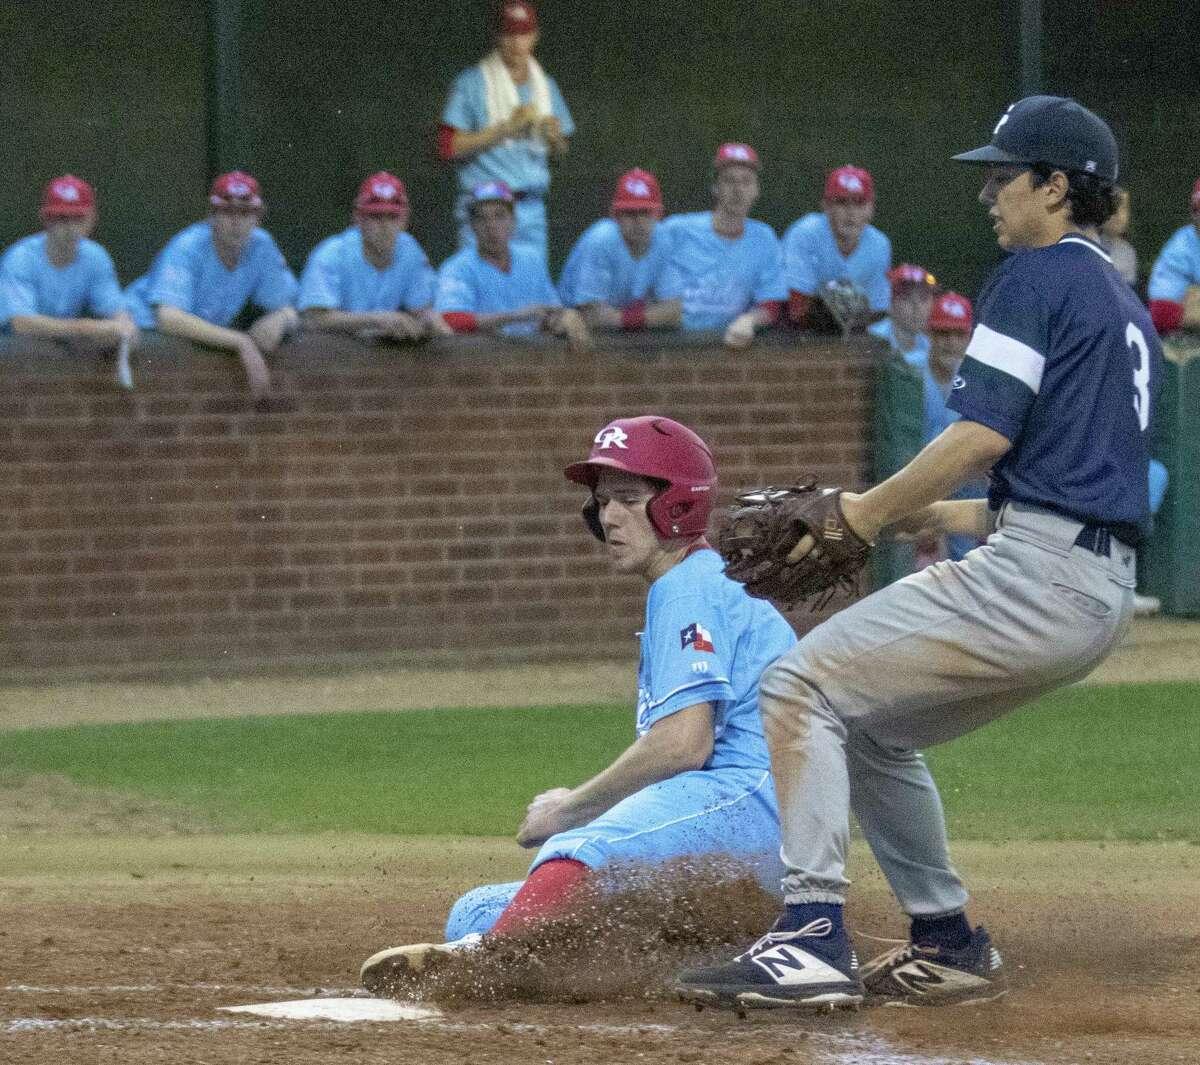 Oak Ridge first baseman Kevin Skweres (23) slides into home plate during a District 15-6A baseball game at Oak Ridge High School.